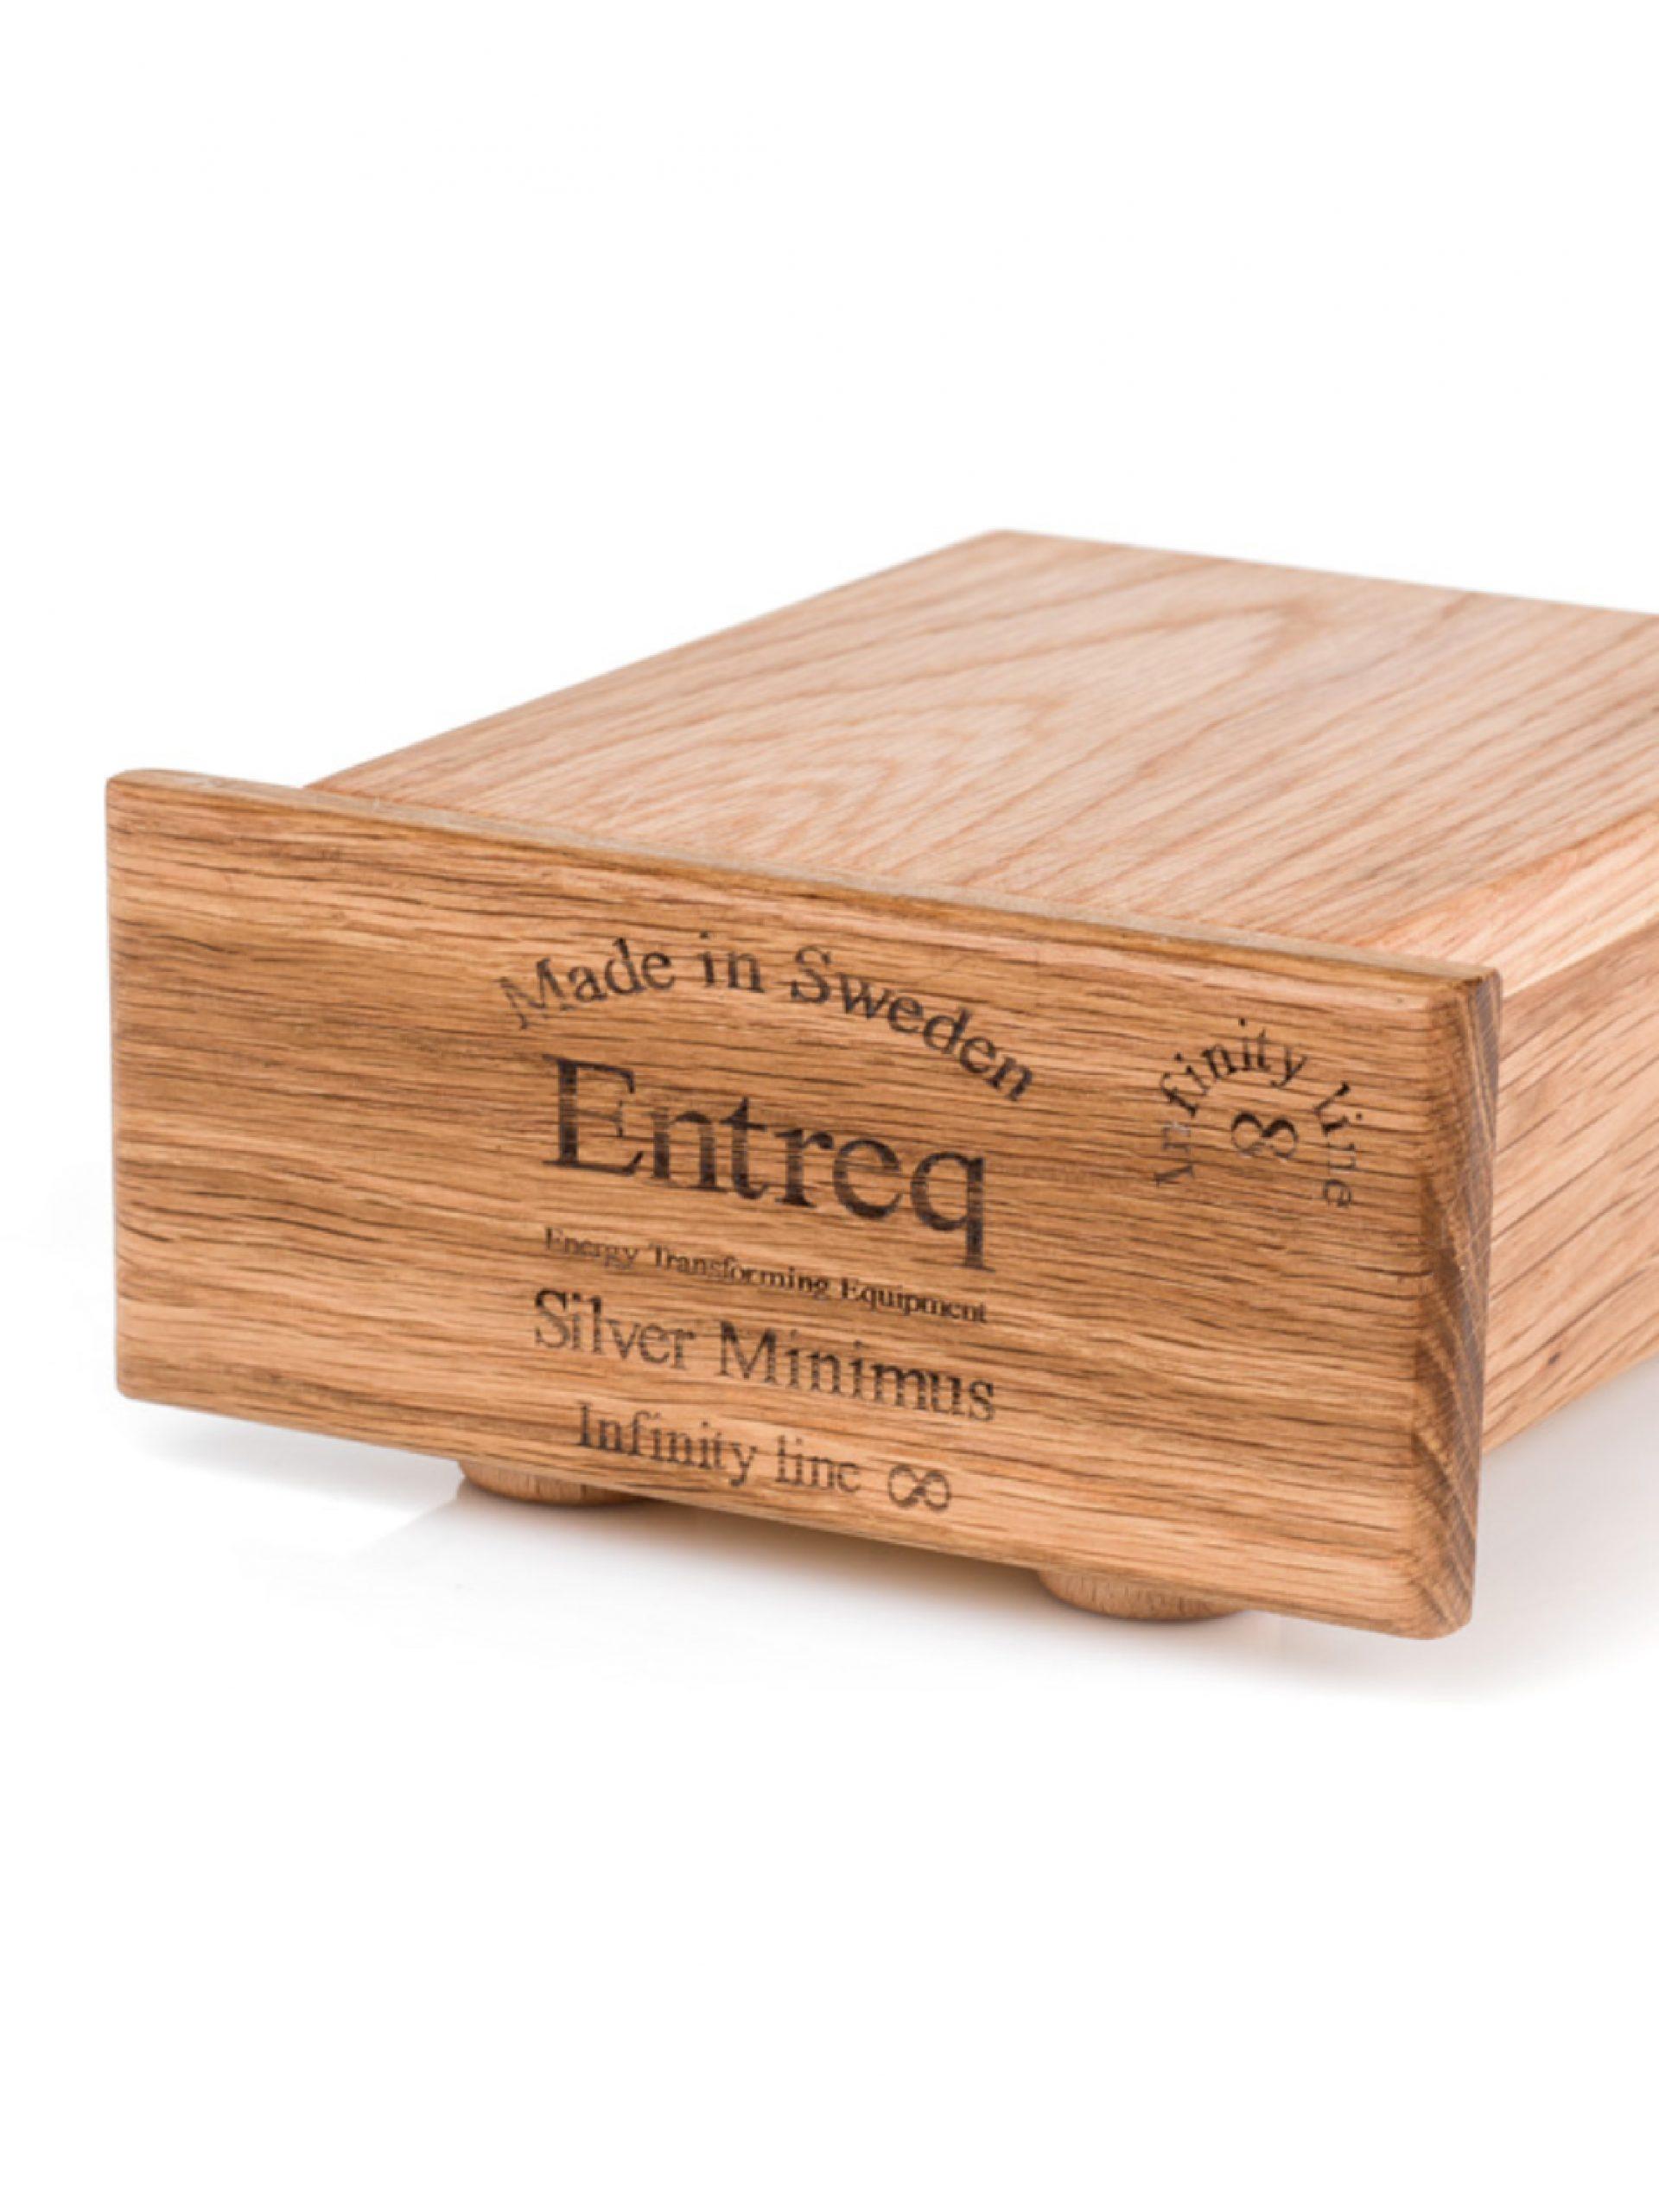 Entreq Silver Minimus Infinity